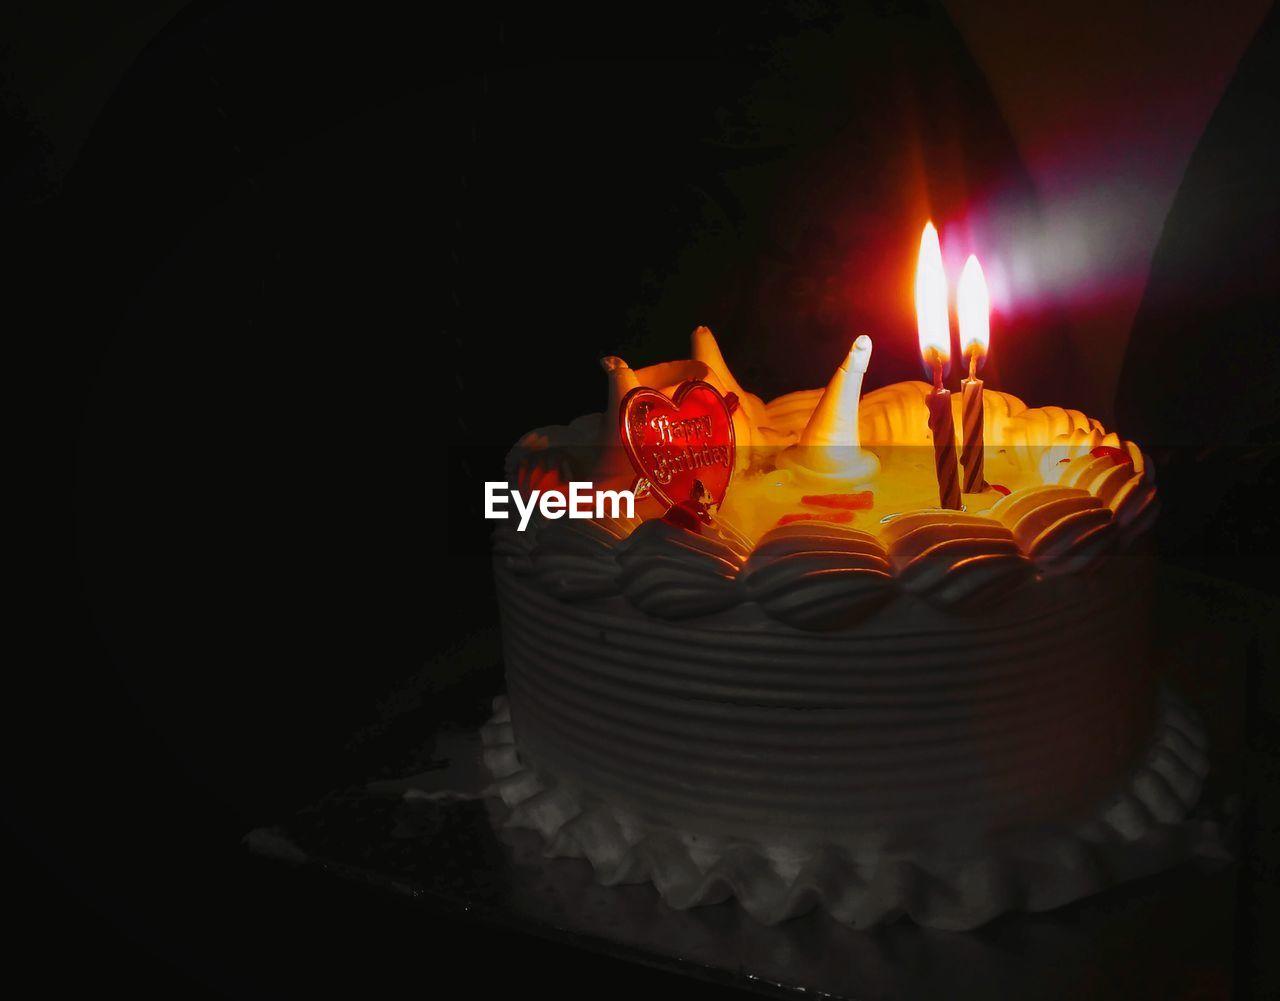 flame, candle, burning, glowing, illuminated, heat - temperature, no people, indoors, cake, darkroom, birthday cake, celebration, sweet food, birthday candles, close-up, night, diya - oil lamp